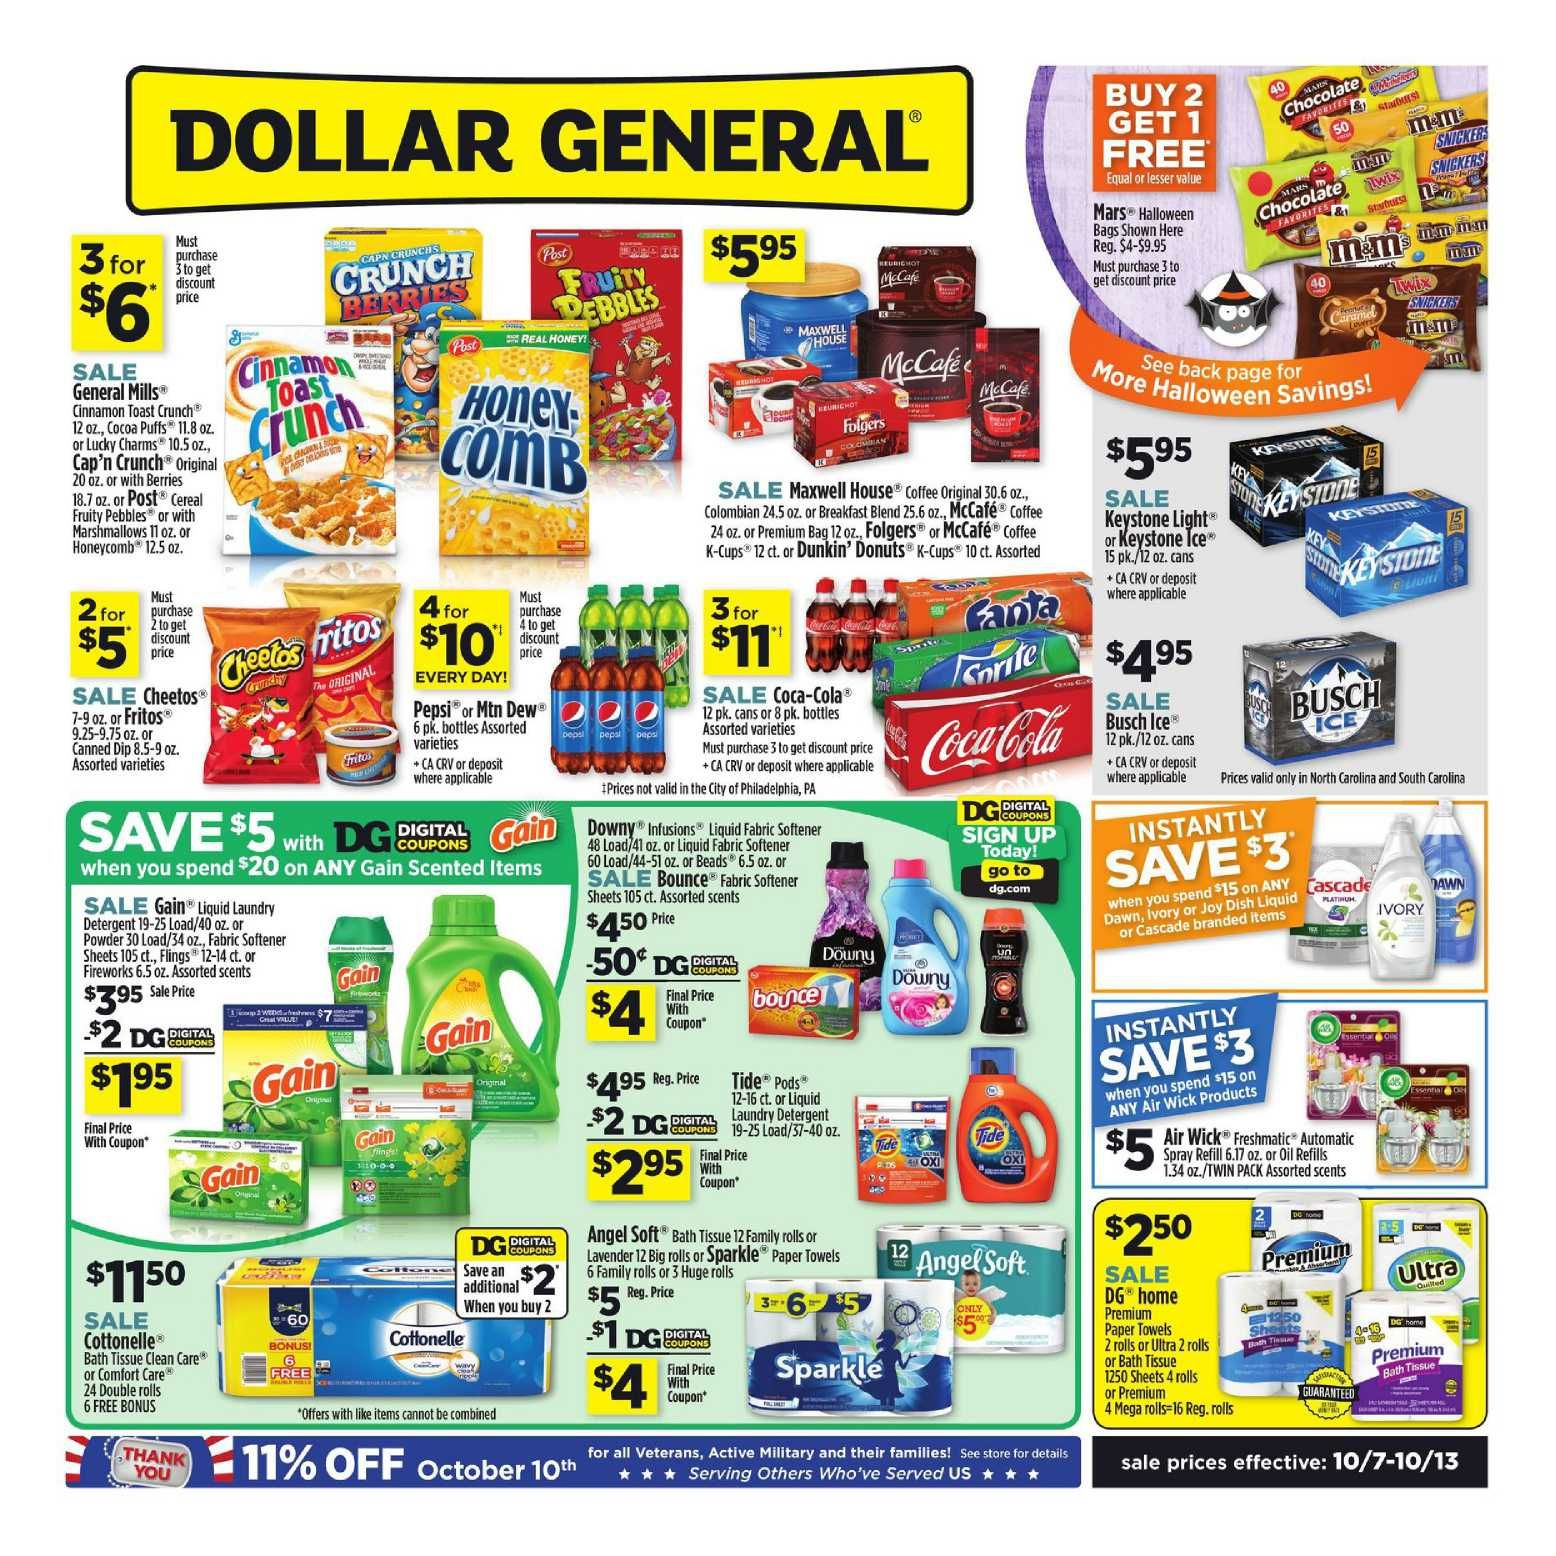 Dollar General Weekly Ad Flyer January 20 26 2019 Weeklyad123 Com Weekly Ad Circular Grocery Stores Dollar General Weekly Ads Sunday Ads